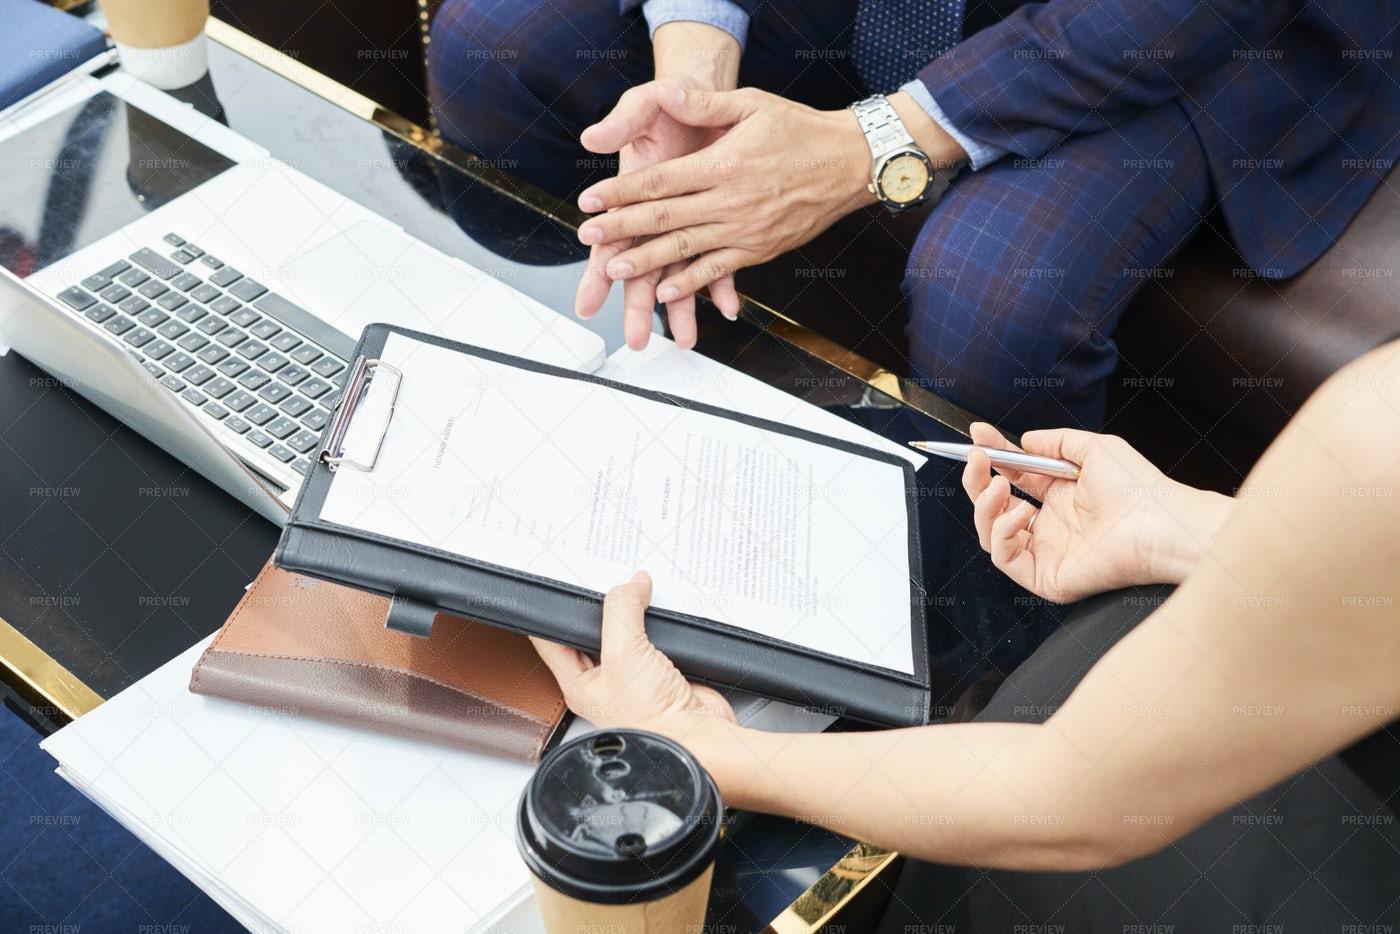 Discussing Partnership Agreement: Stock Photos